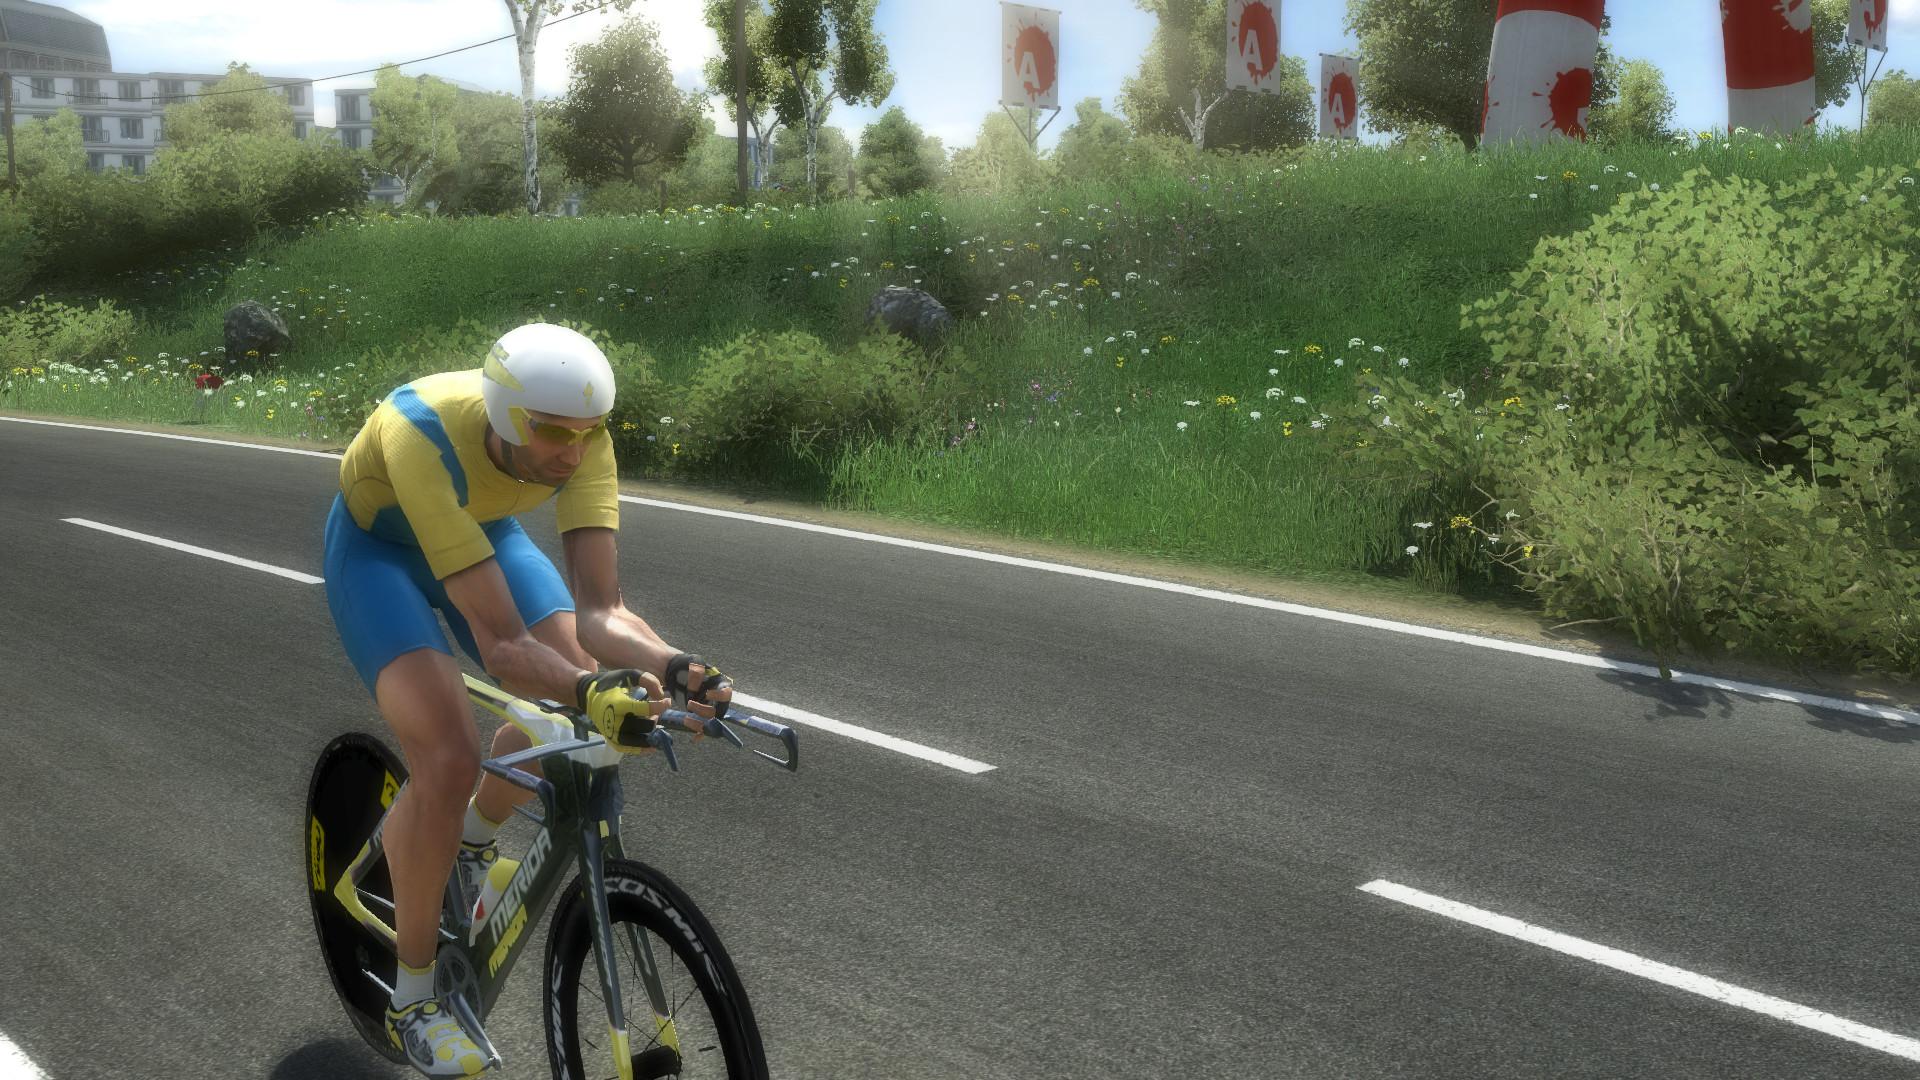 pcmdaily.com/images/mg/2019/Races/HC/Denmark/S5/34.jpg